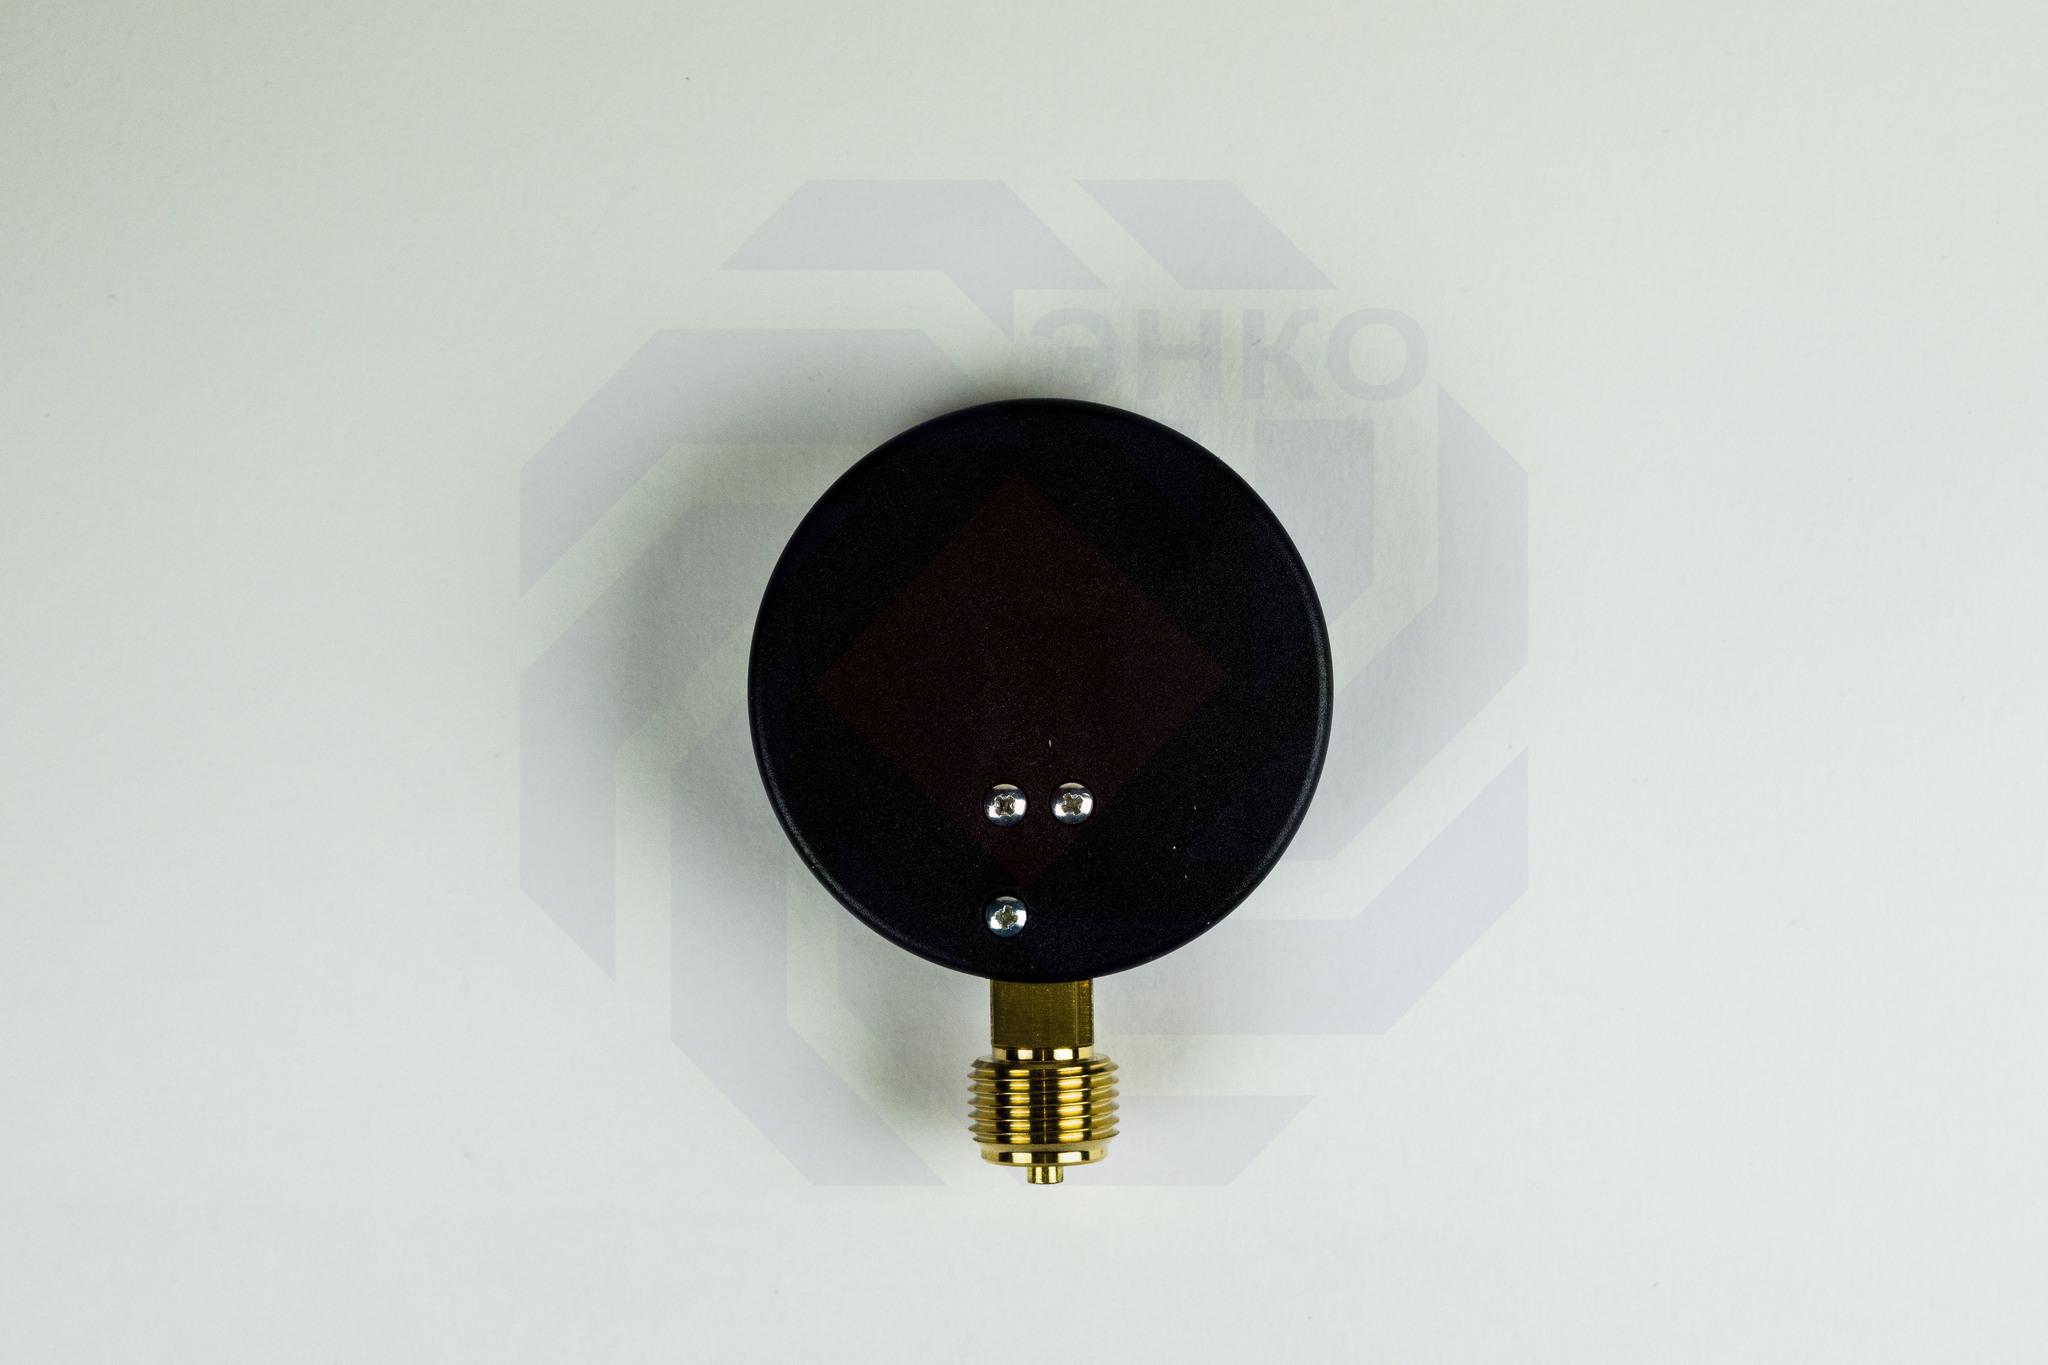 Манометр радиальный WATTS MDR 80/16 (F+R200) 0-16 бар 80 мм ½